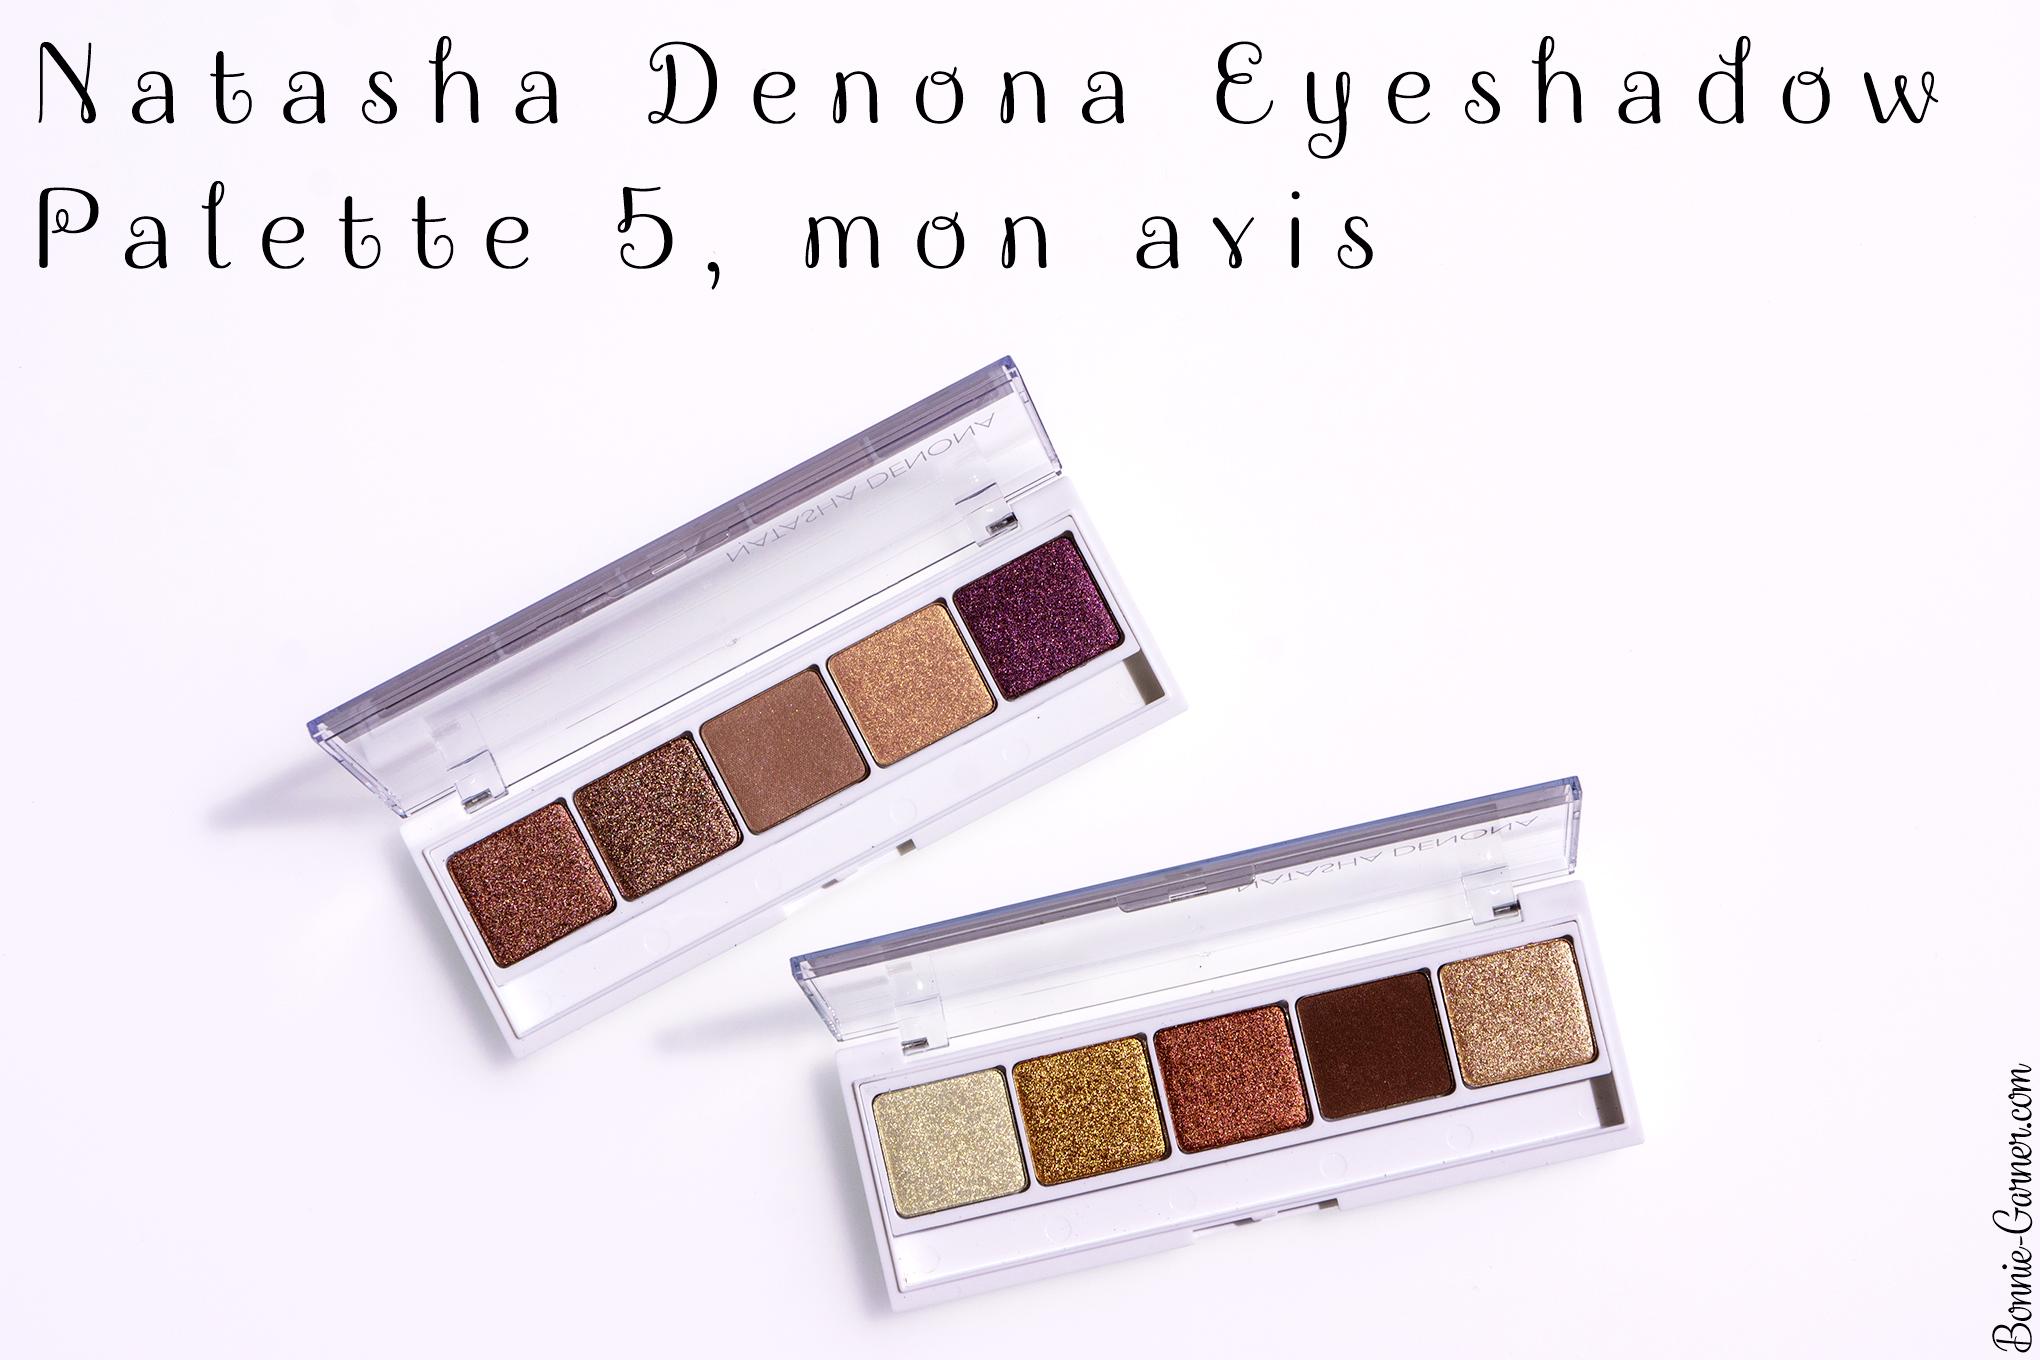 Natasha Denona Eyeshadow Palette 5, mon avis